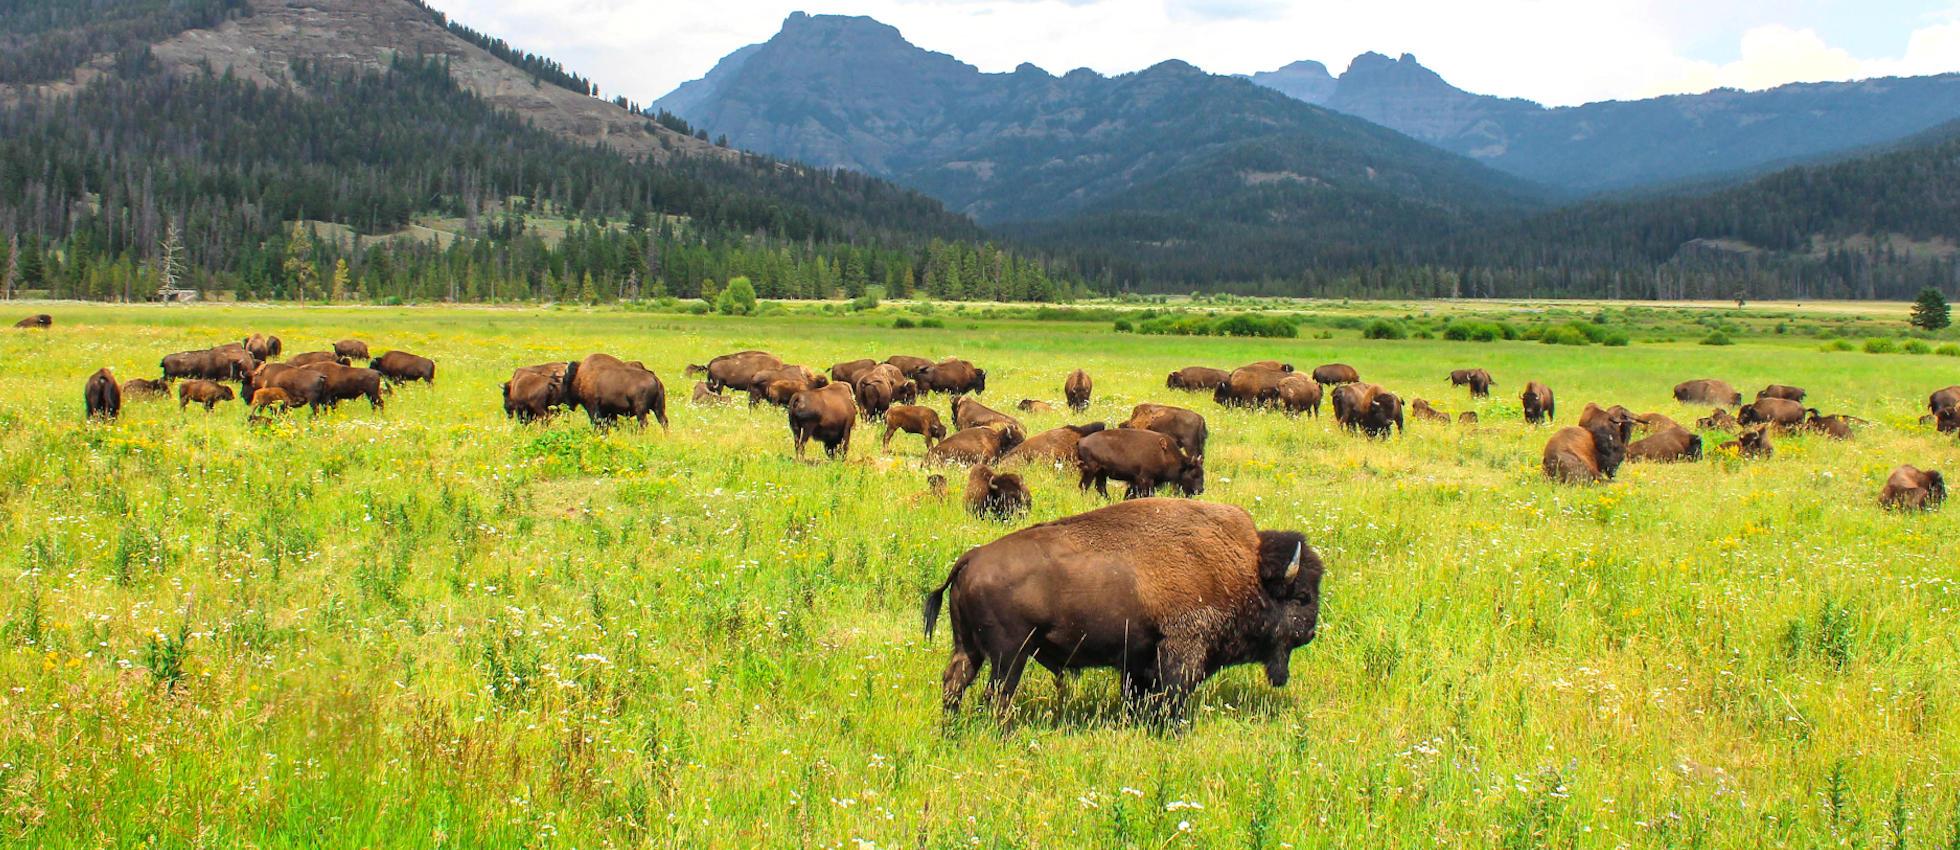 Gap Year Program - ARCC Gap   Northwest: Wyoming, Montana, Idaho, Washington & Hawaii  6